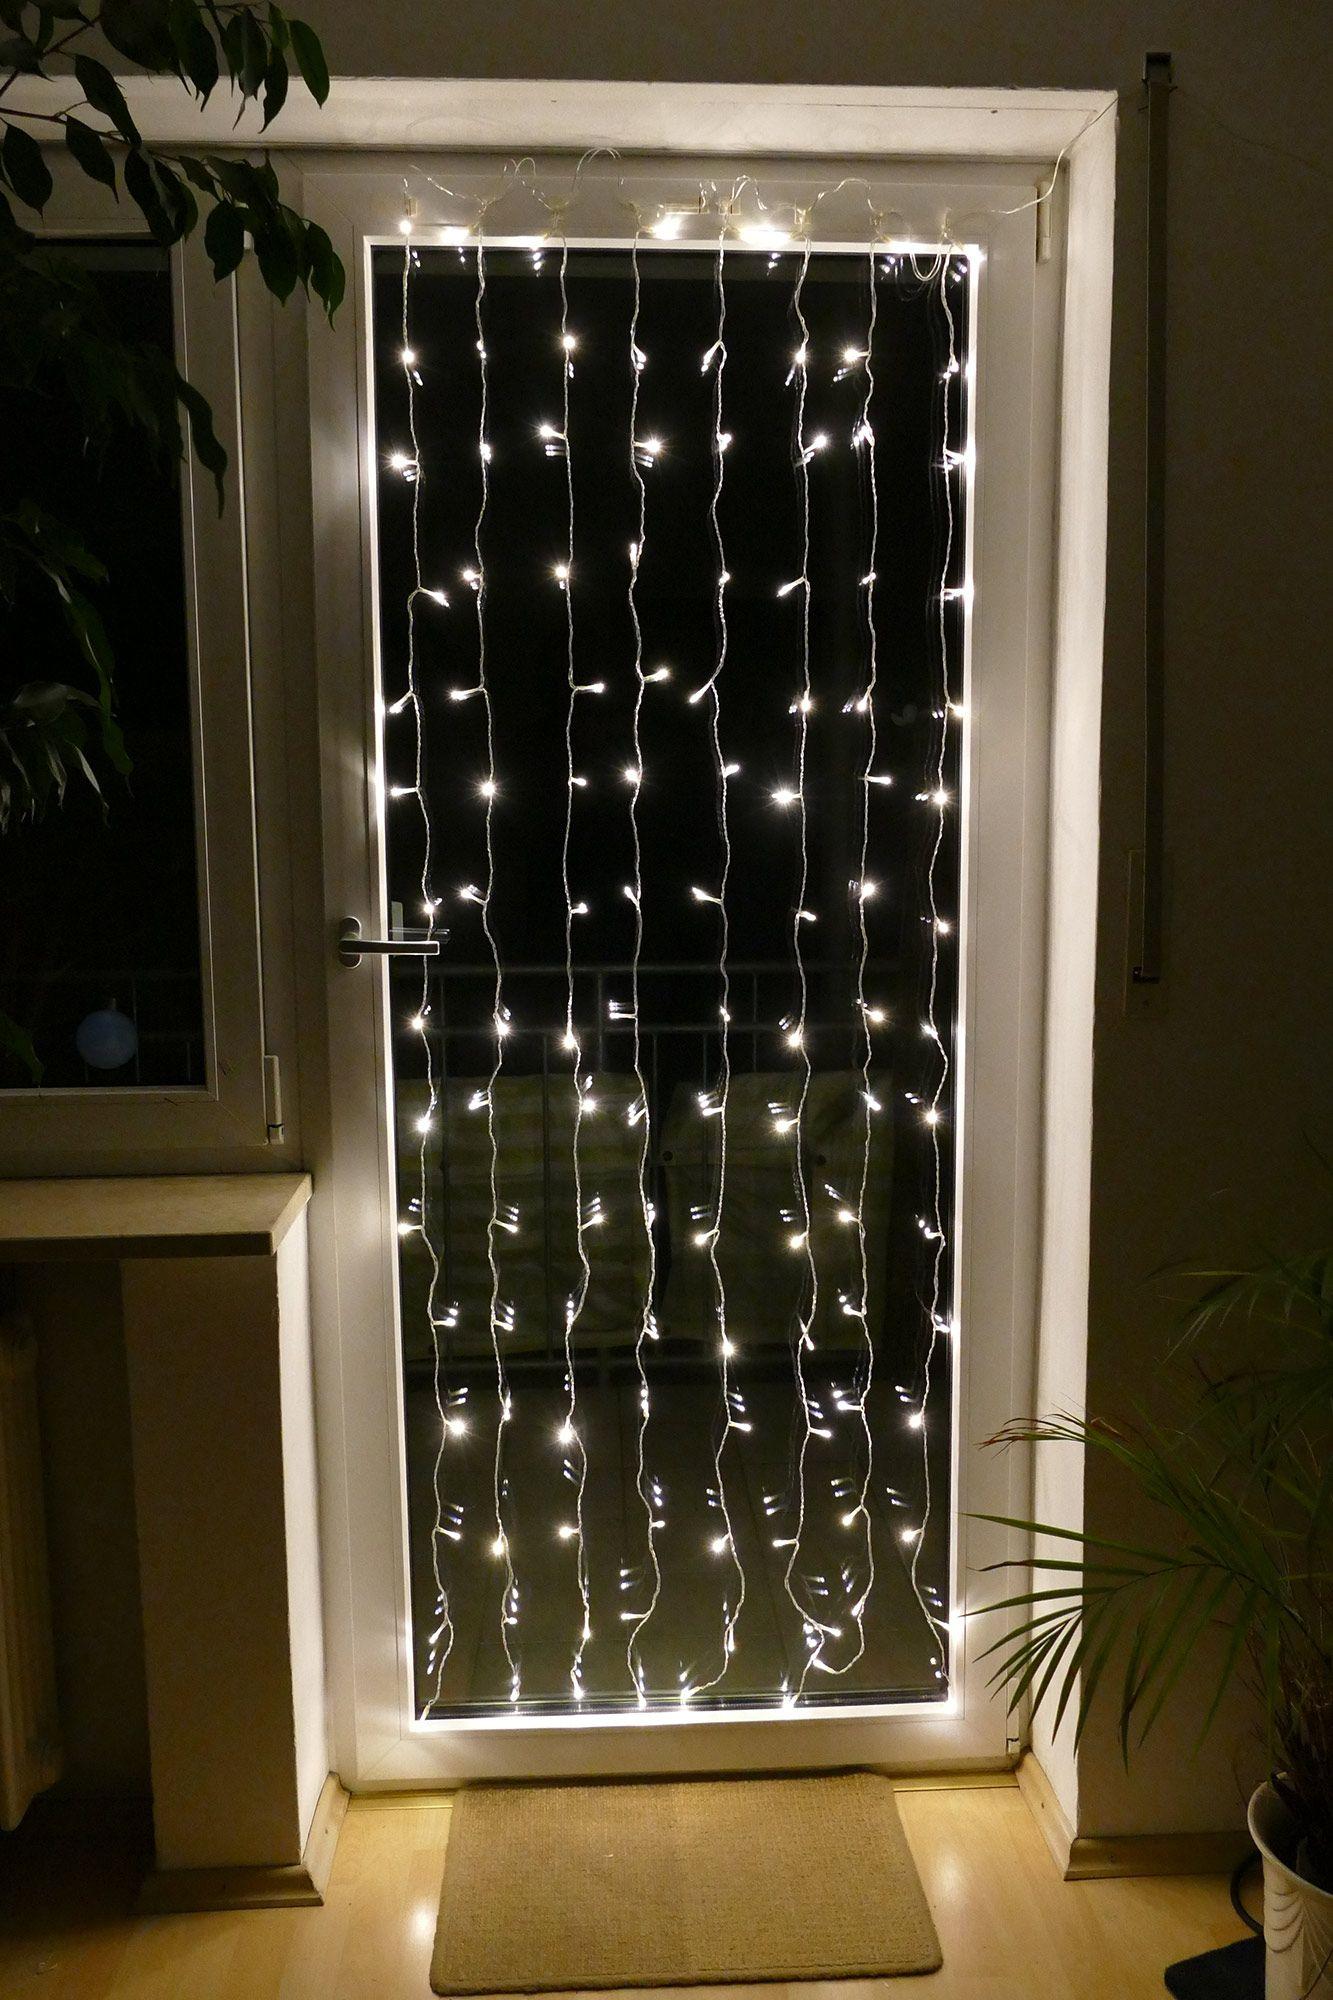 Fensterbeleuchtung Weihnachten Led.Lichtervorhang Zur Deko Weihnachten 2018 Fensterbeleuchtung Für